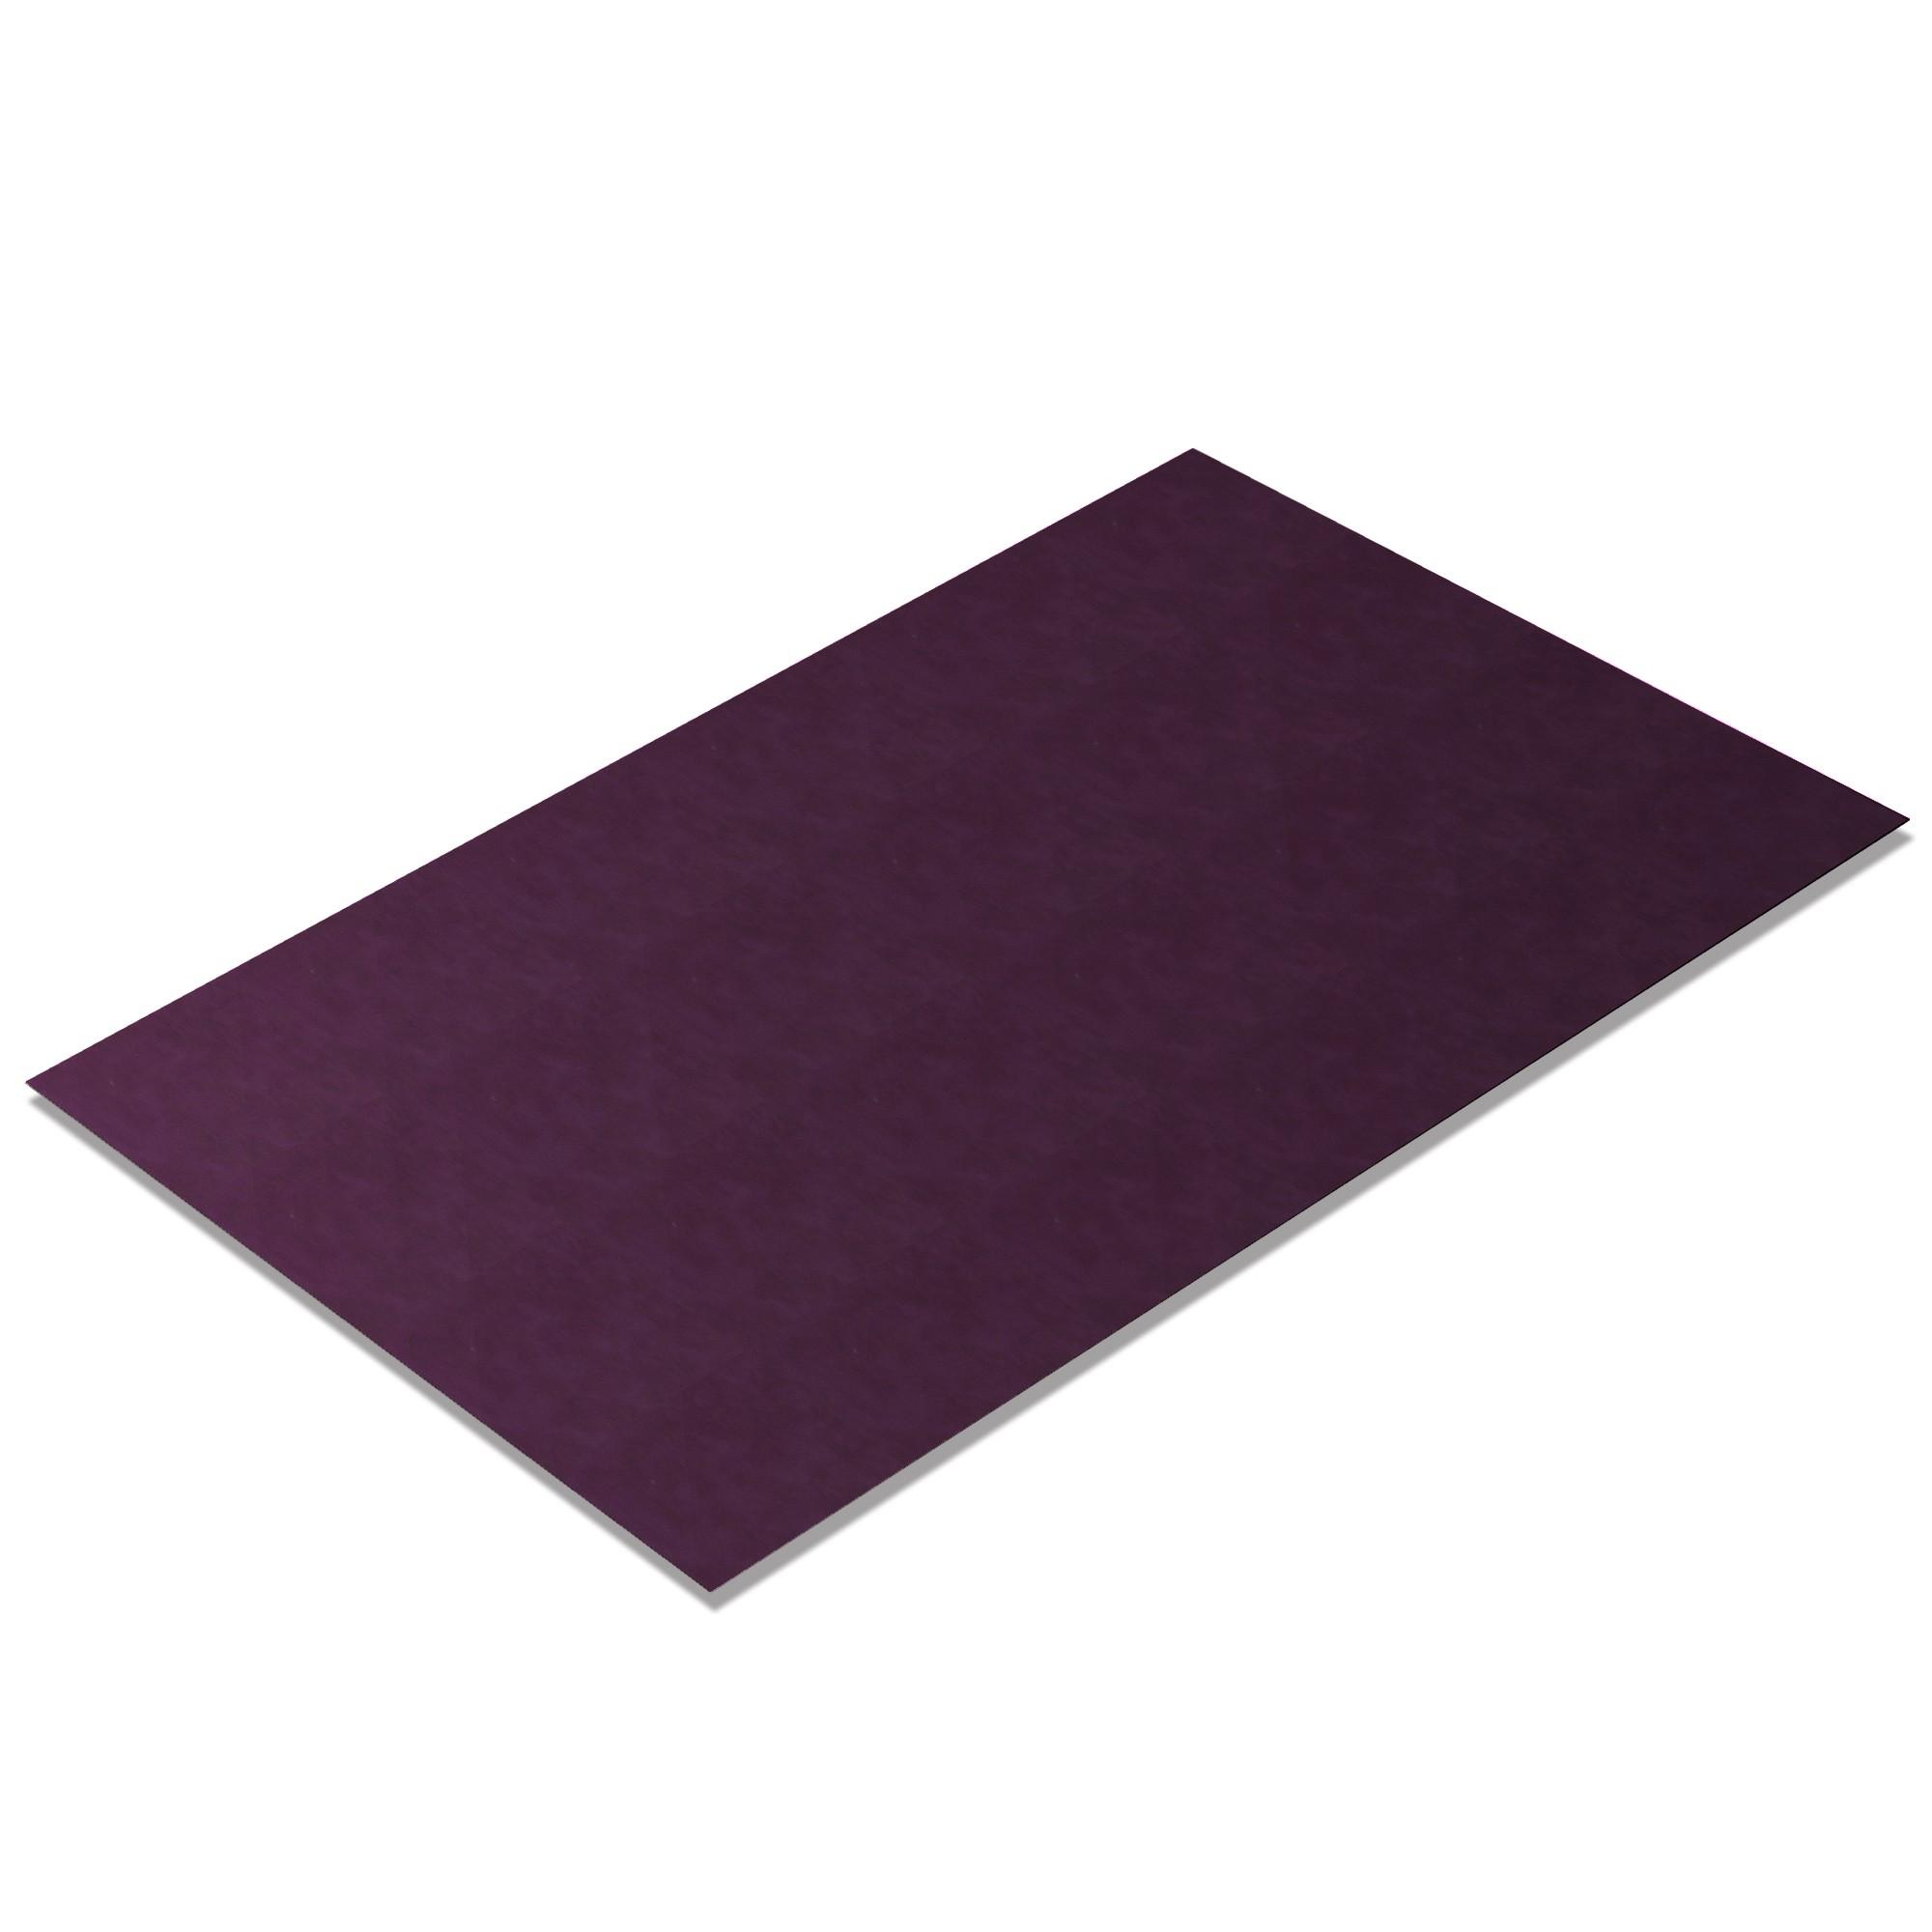 Kunstleder Meterware Freeport Purple [FRE600]